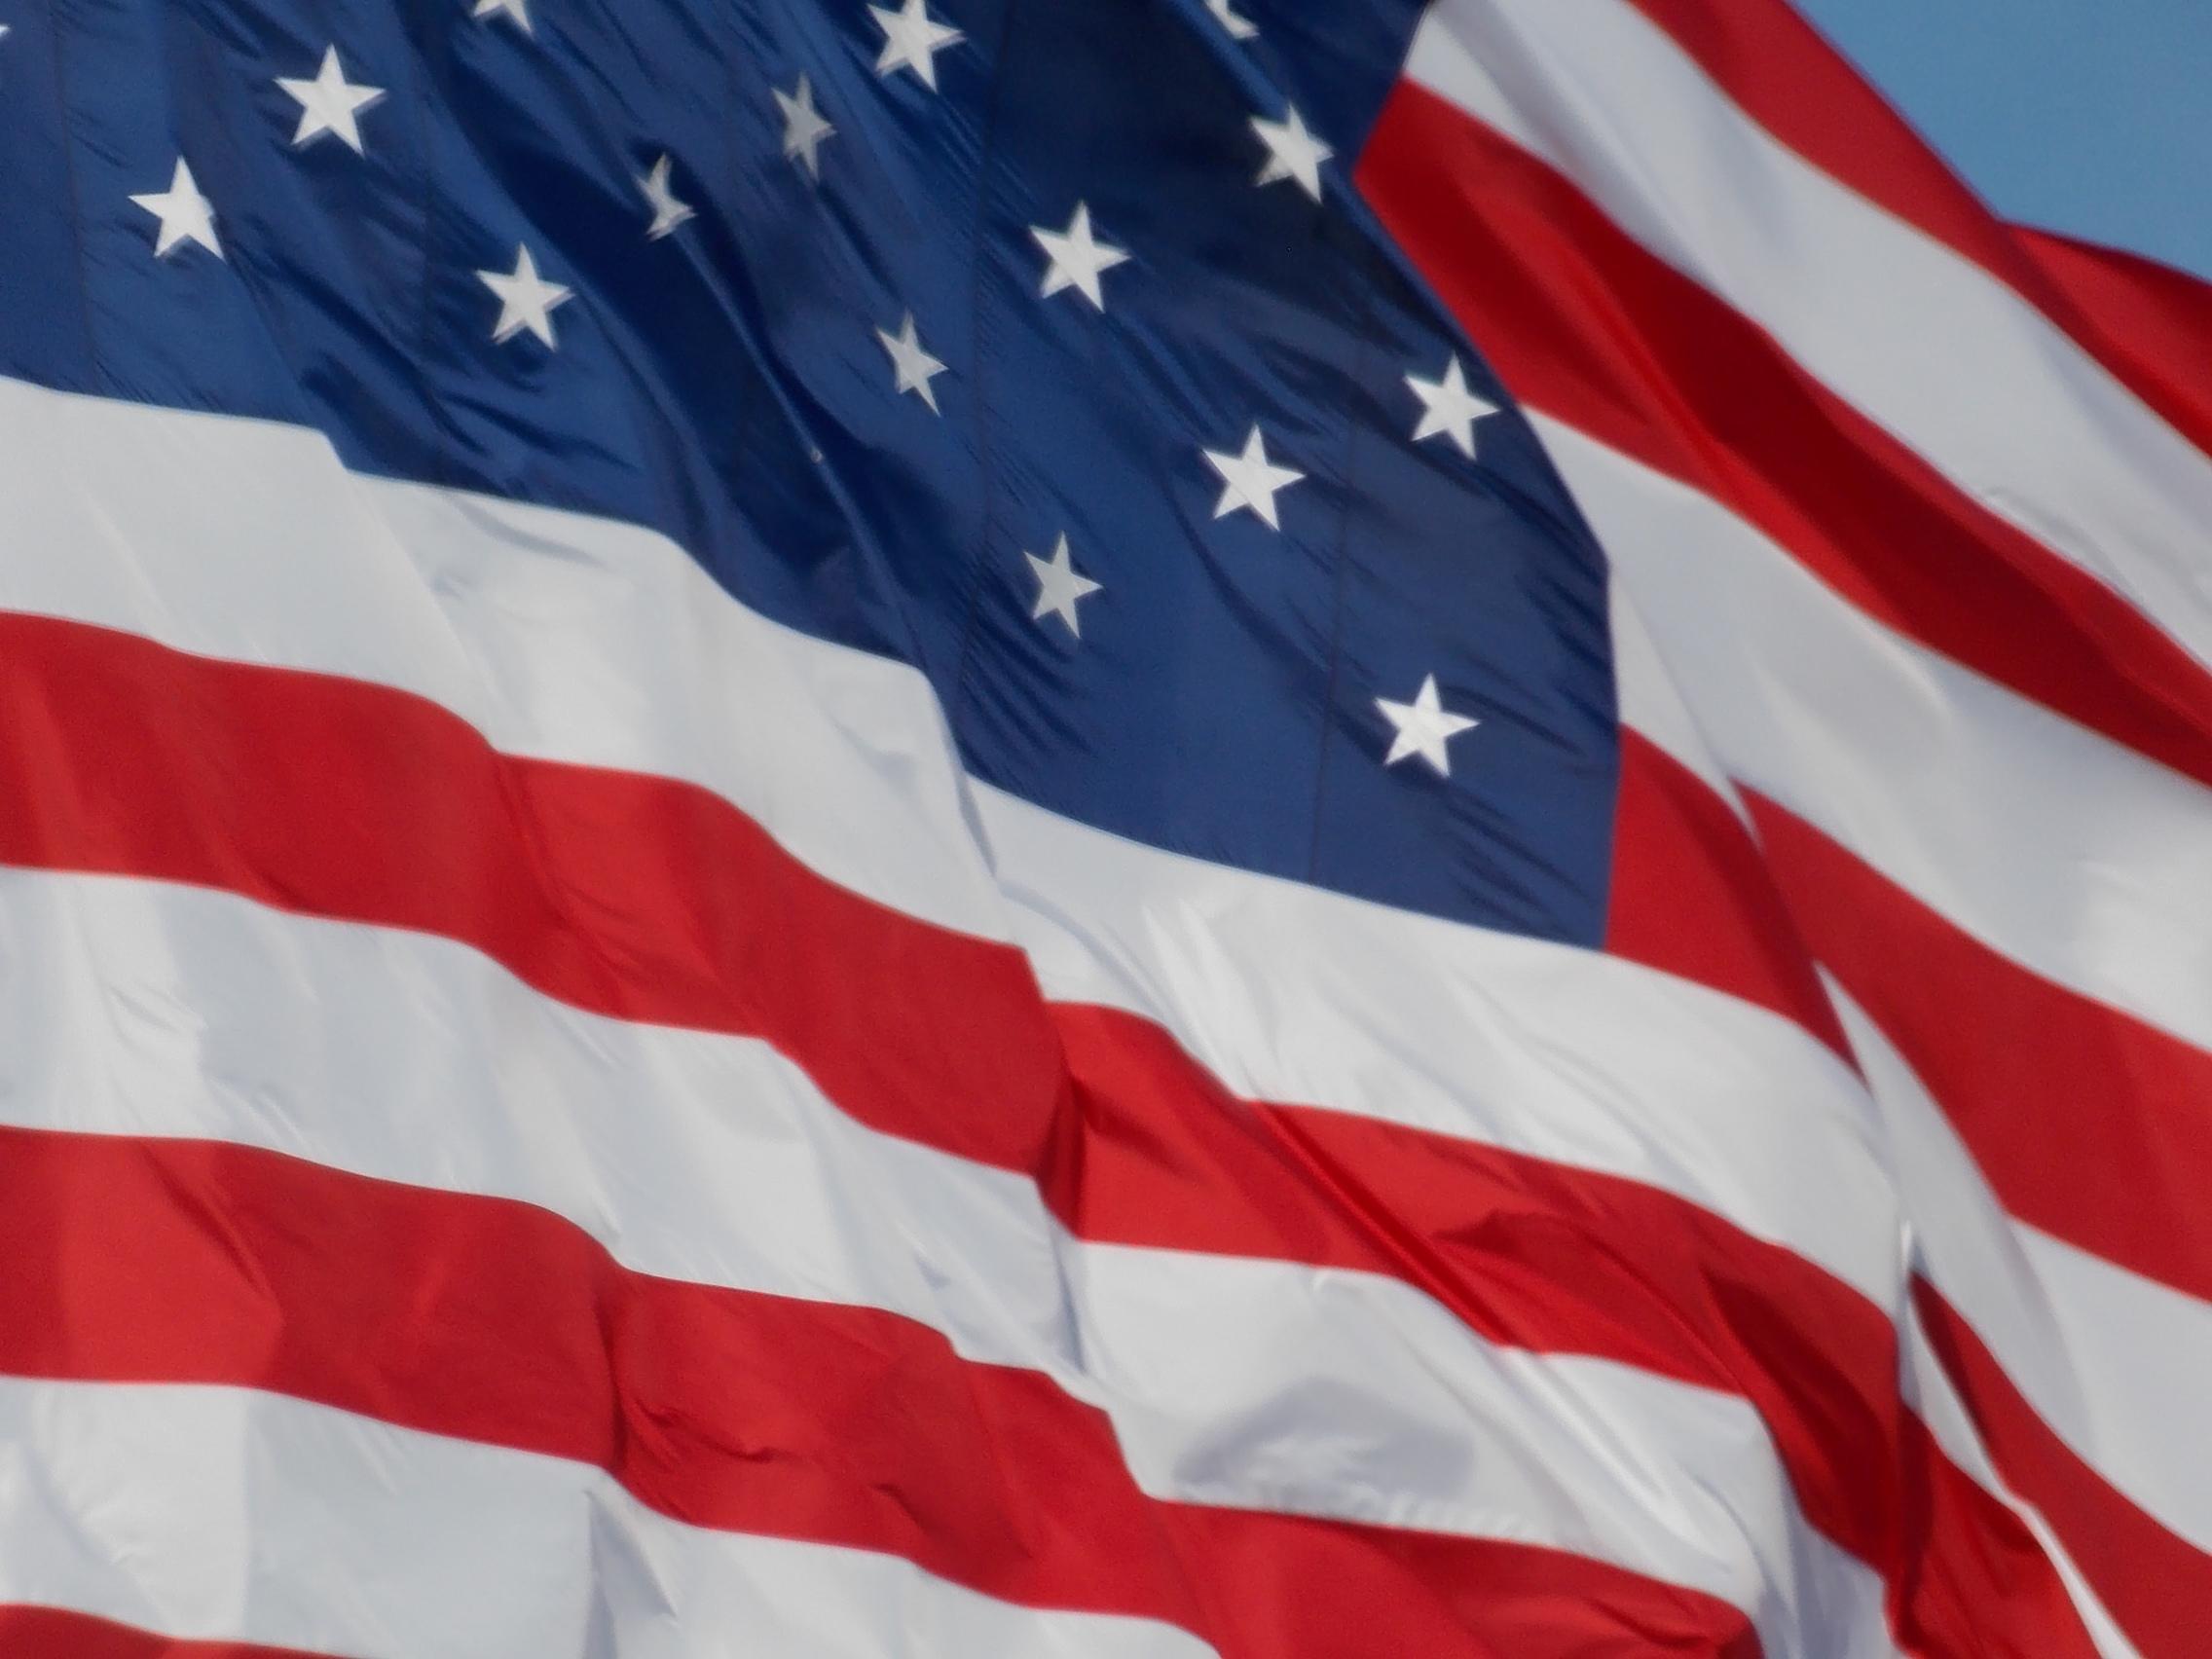 President Trump Orders Flags at Half Staff